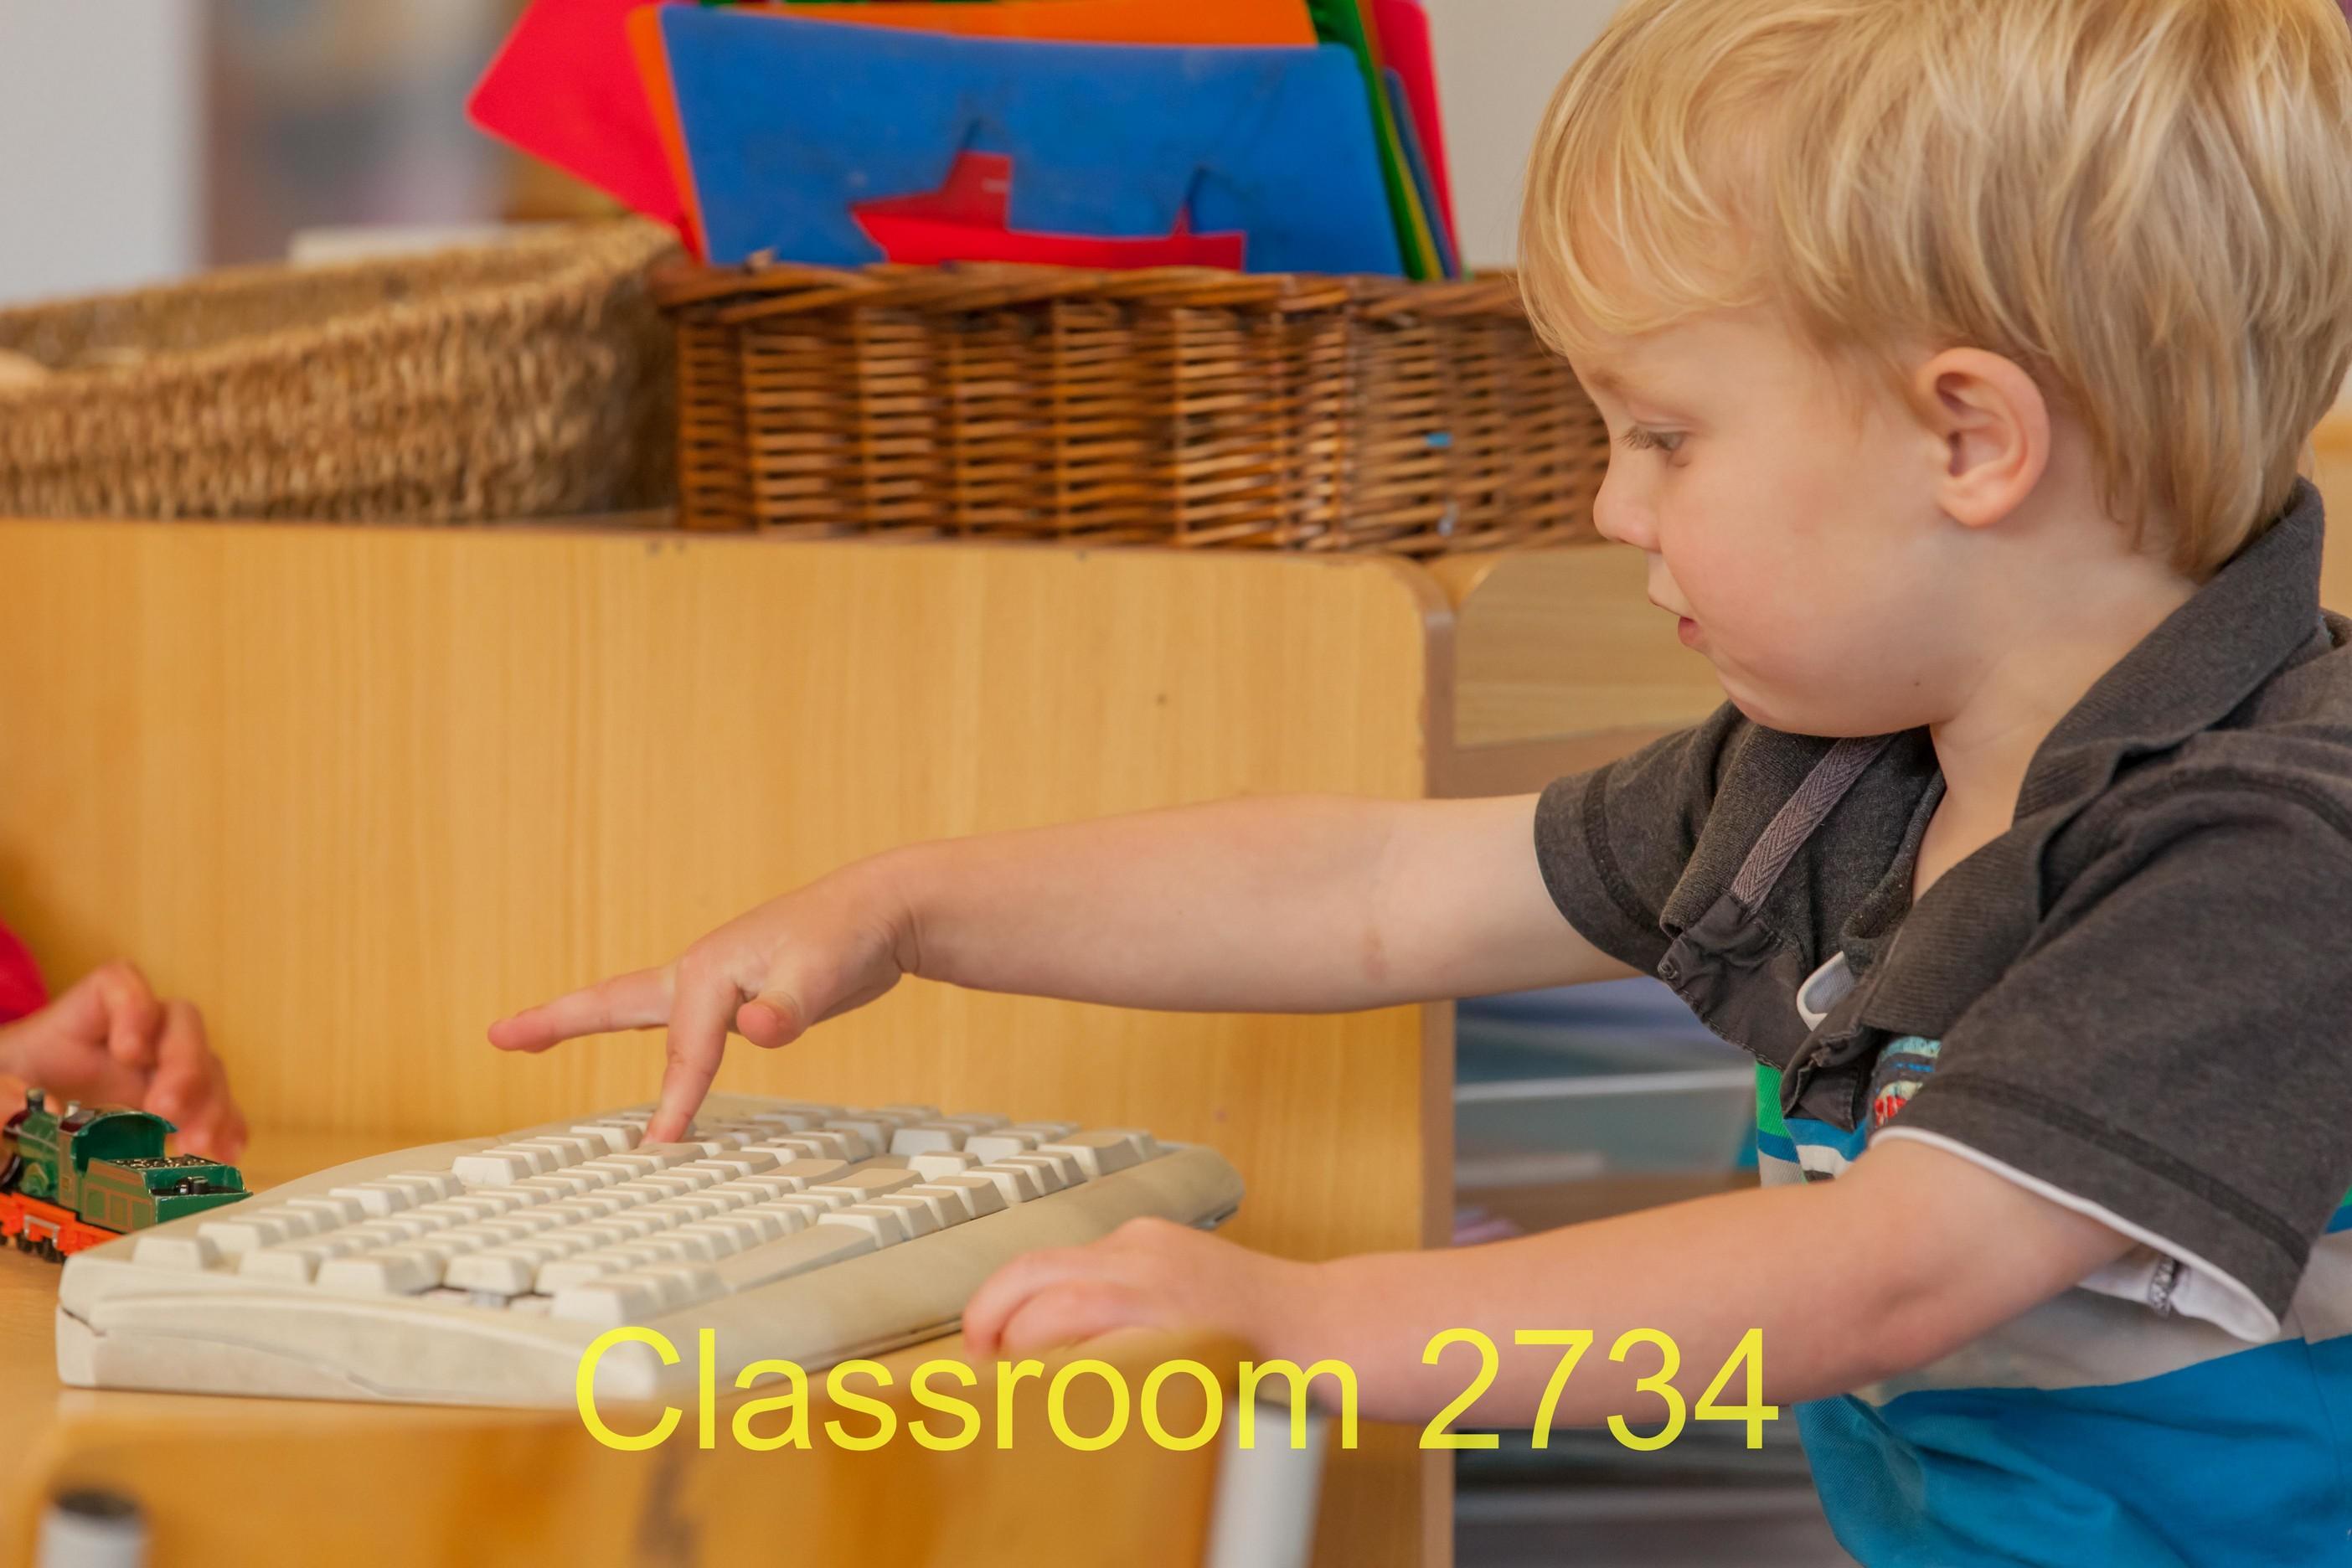 Classroom 2734